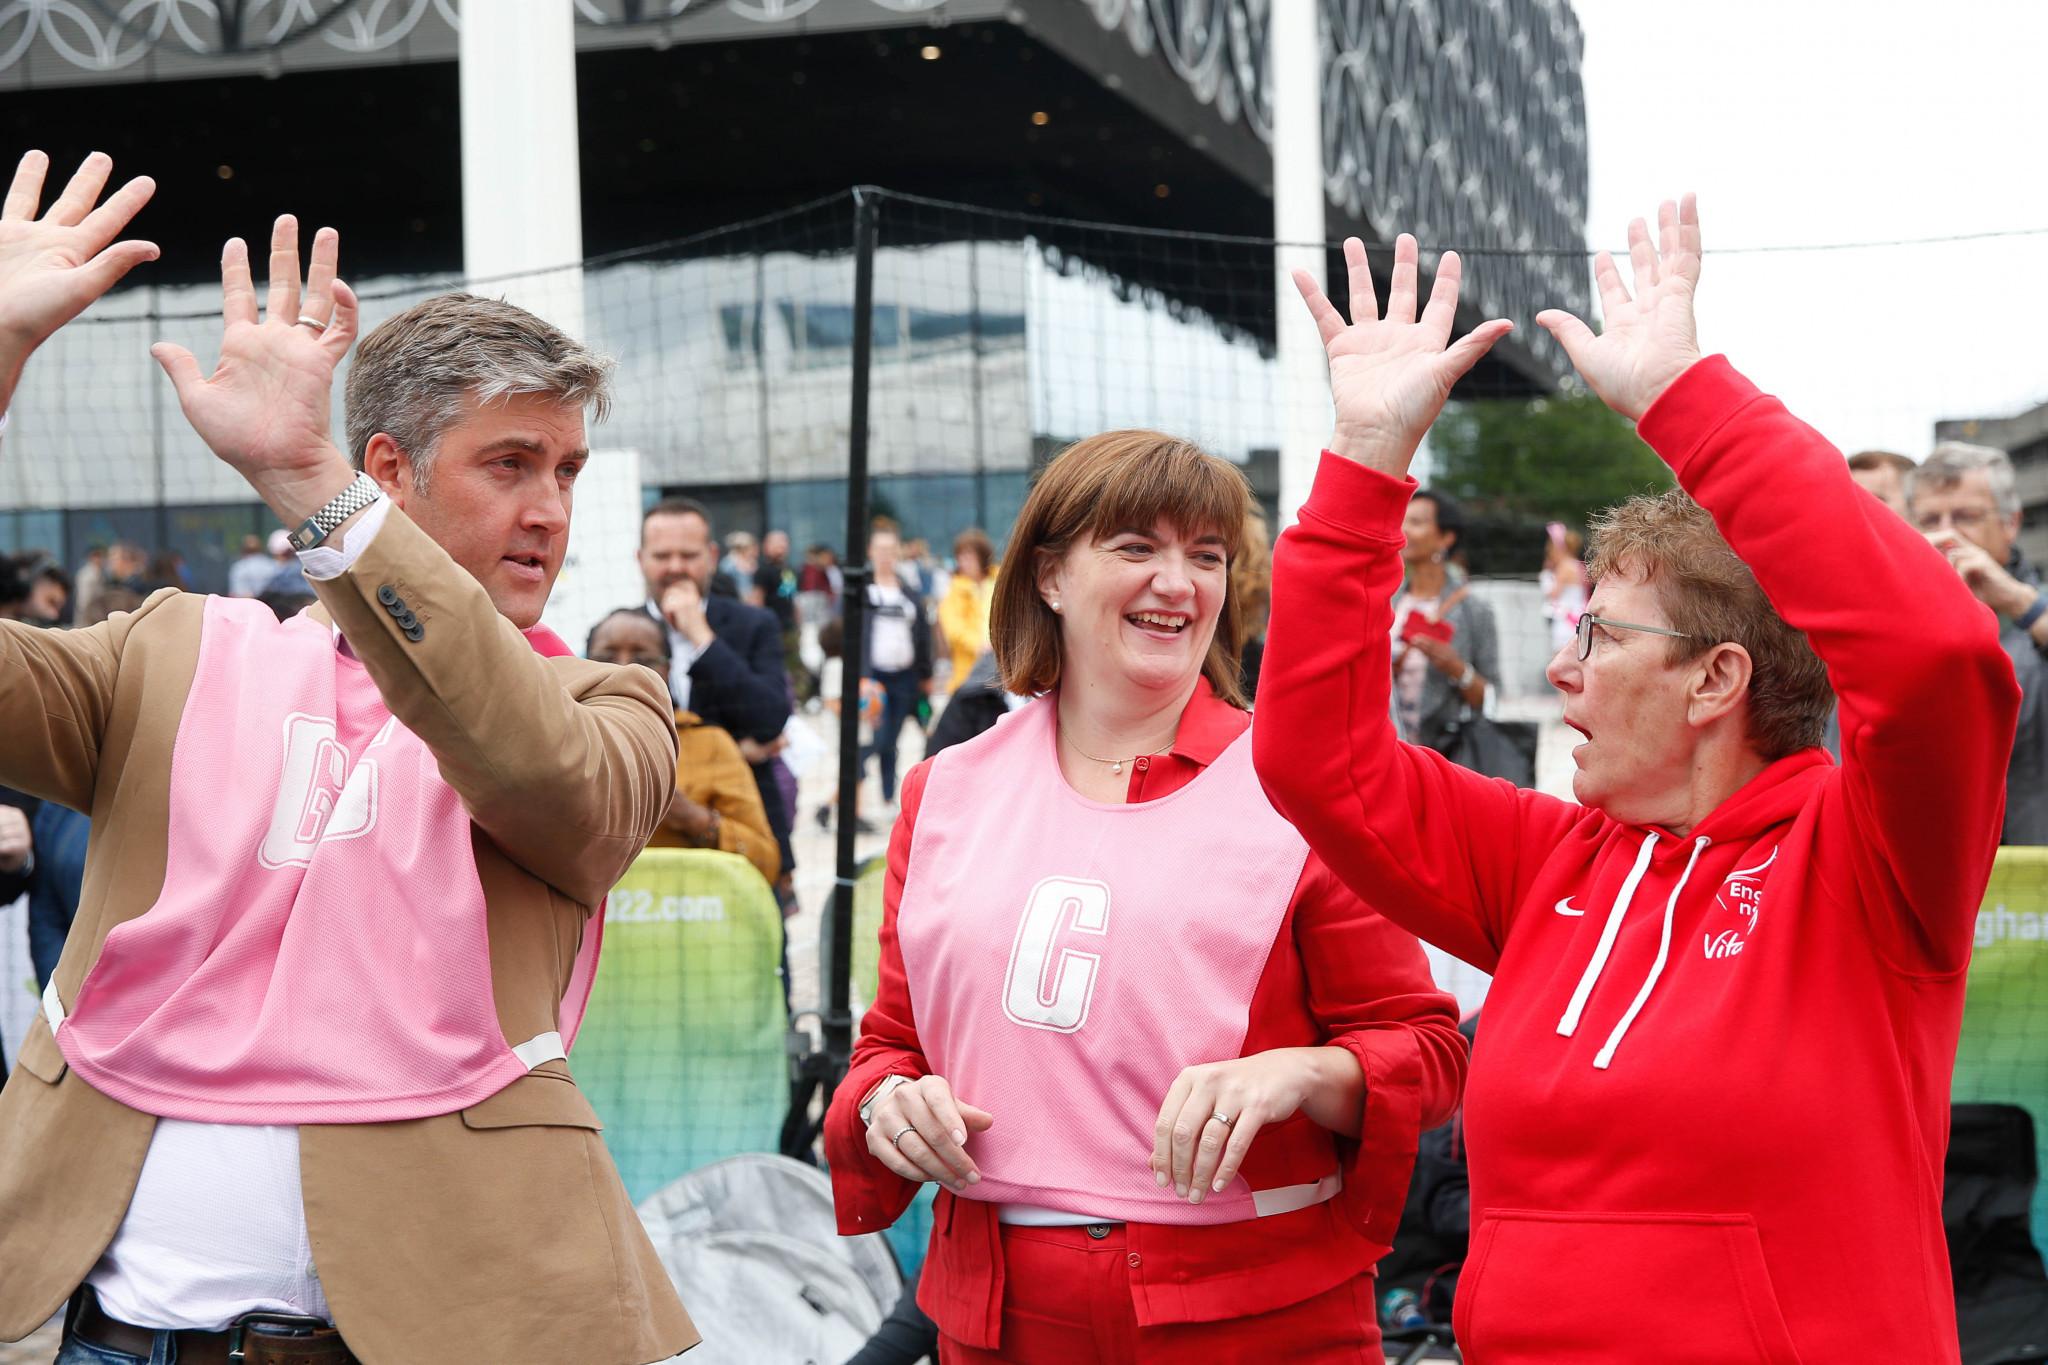 Birmingham 2022 chief executive Ian Reid believes the outlook is